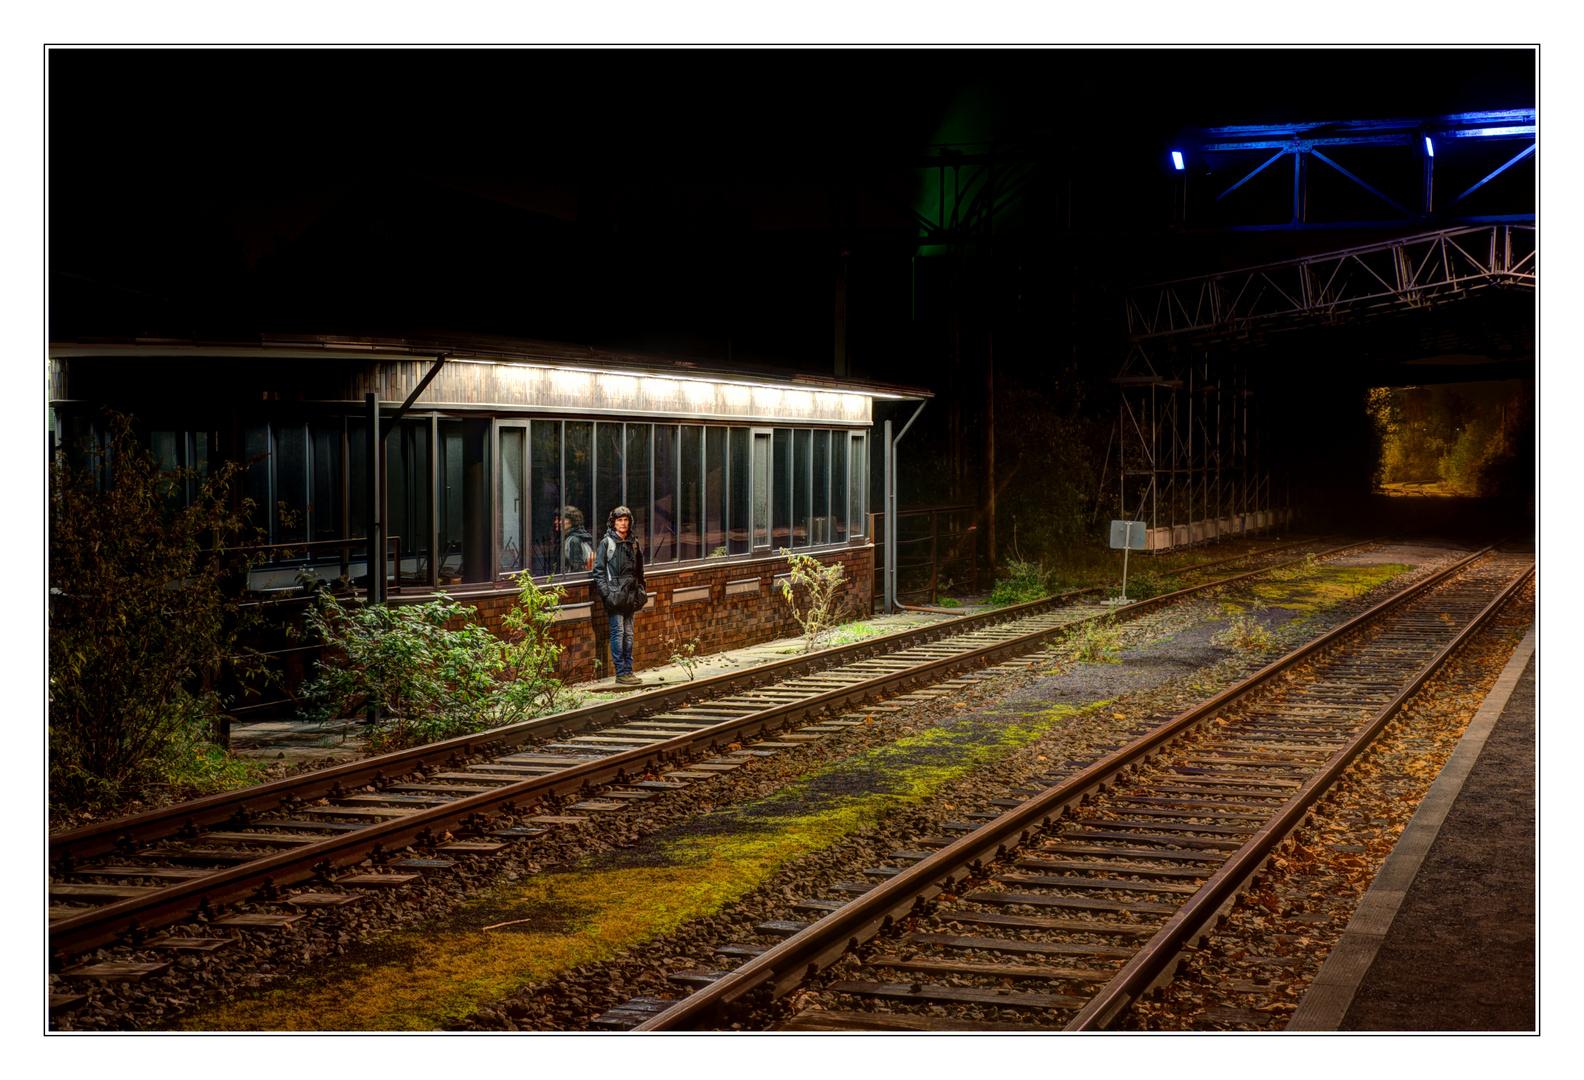 Warten uf en Zug